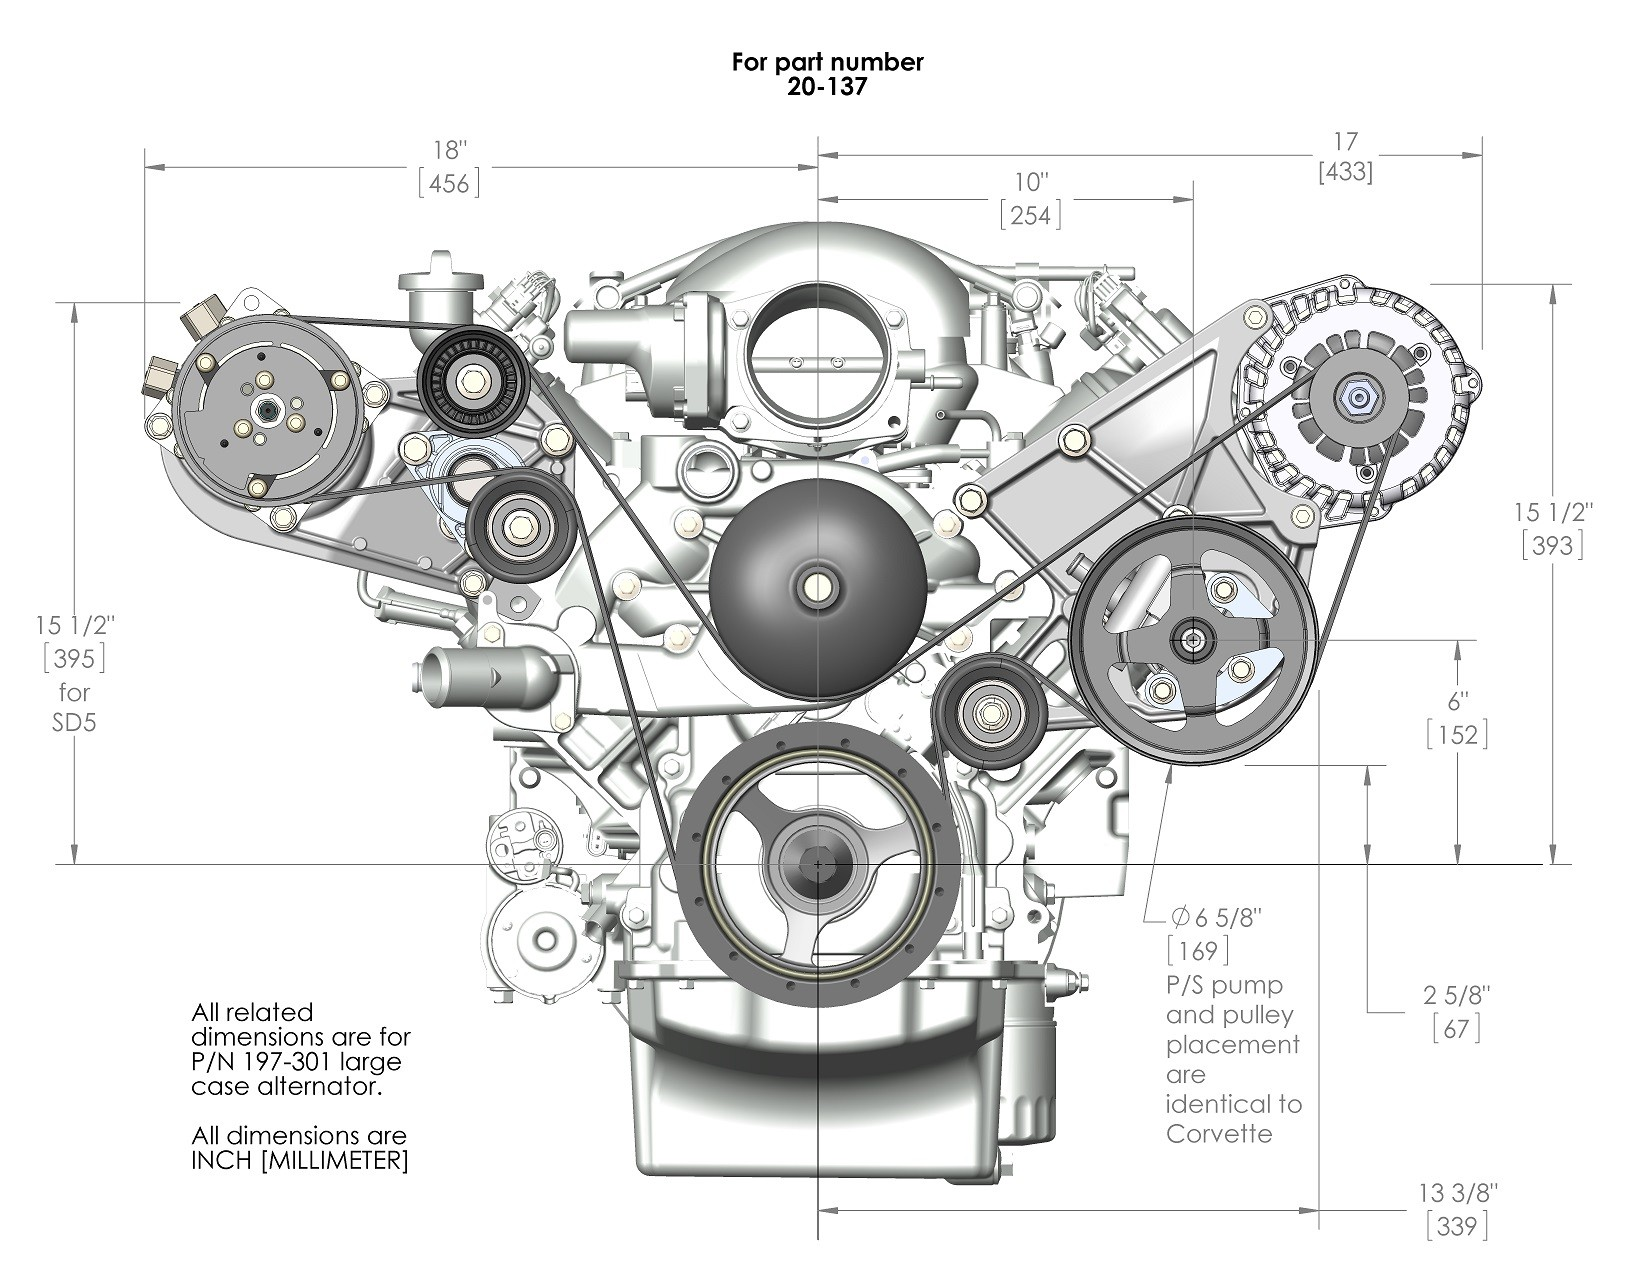 chrysler 3 8 engine diagram 20 137 dimensions1 1650 1275 ls engines rh detoxicrecenze com